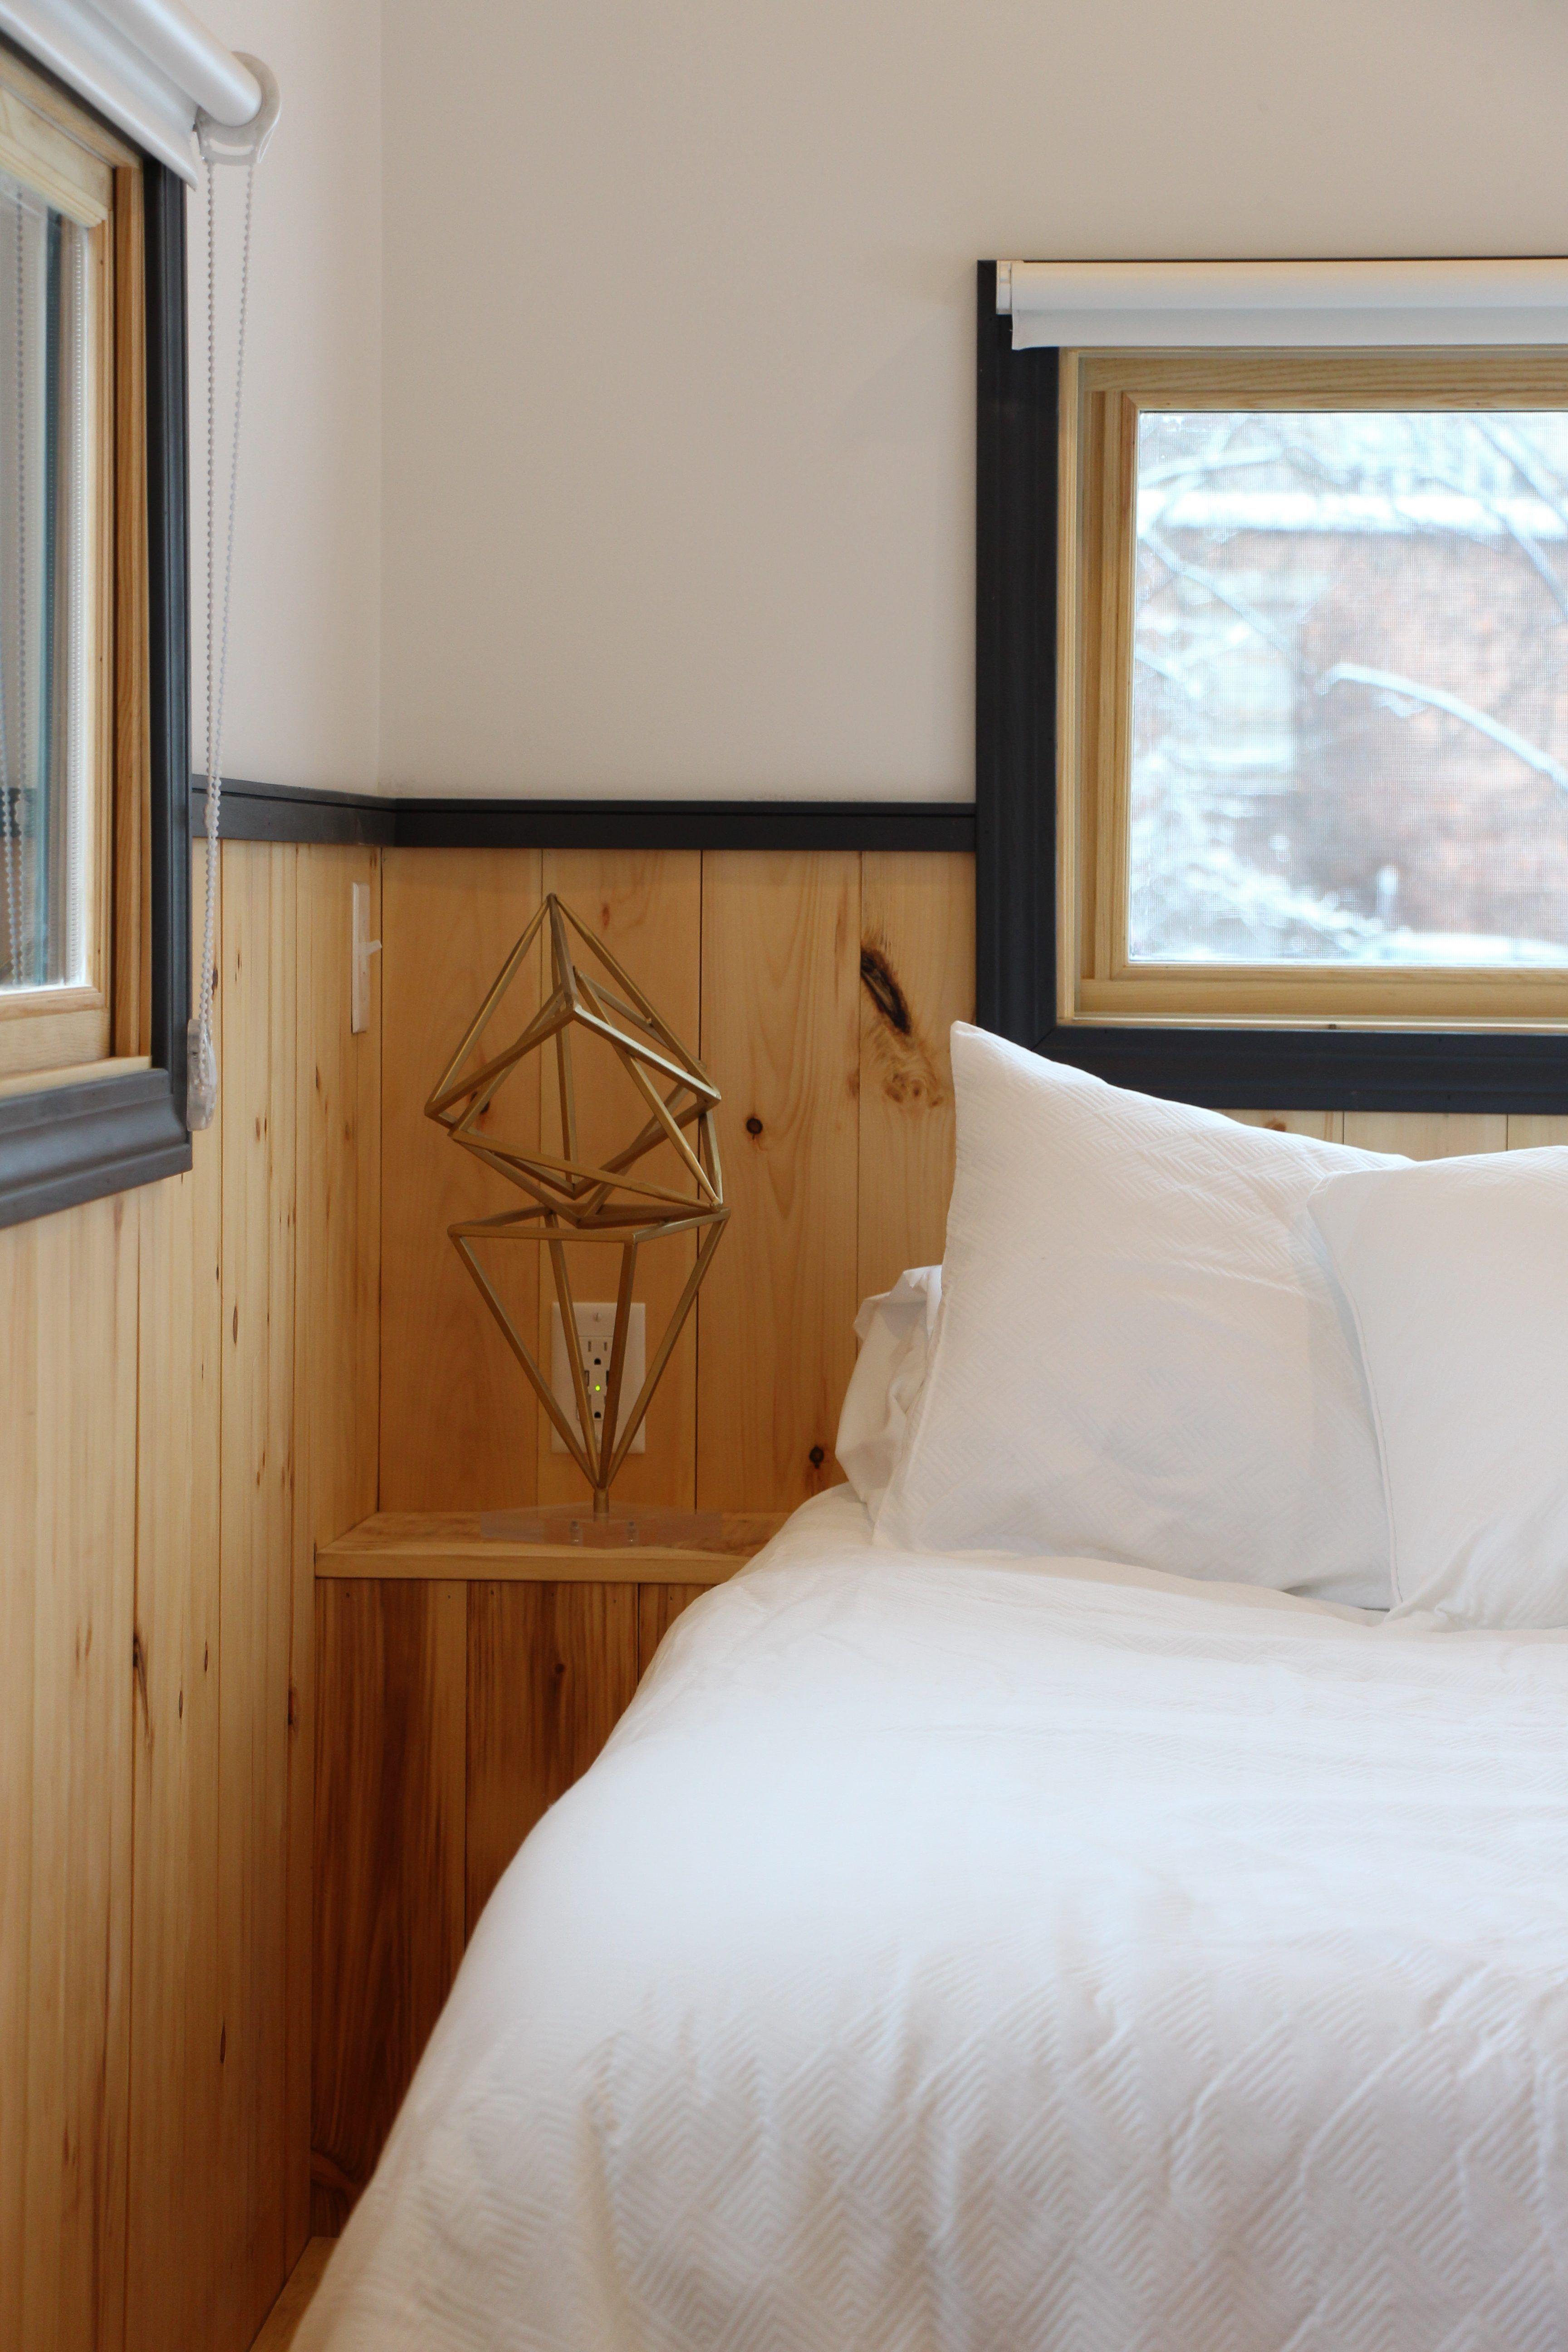 Hudson tiny house 170 SF bedroom with builtin